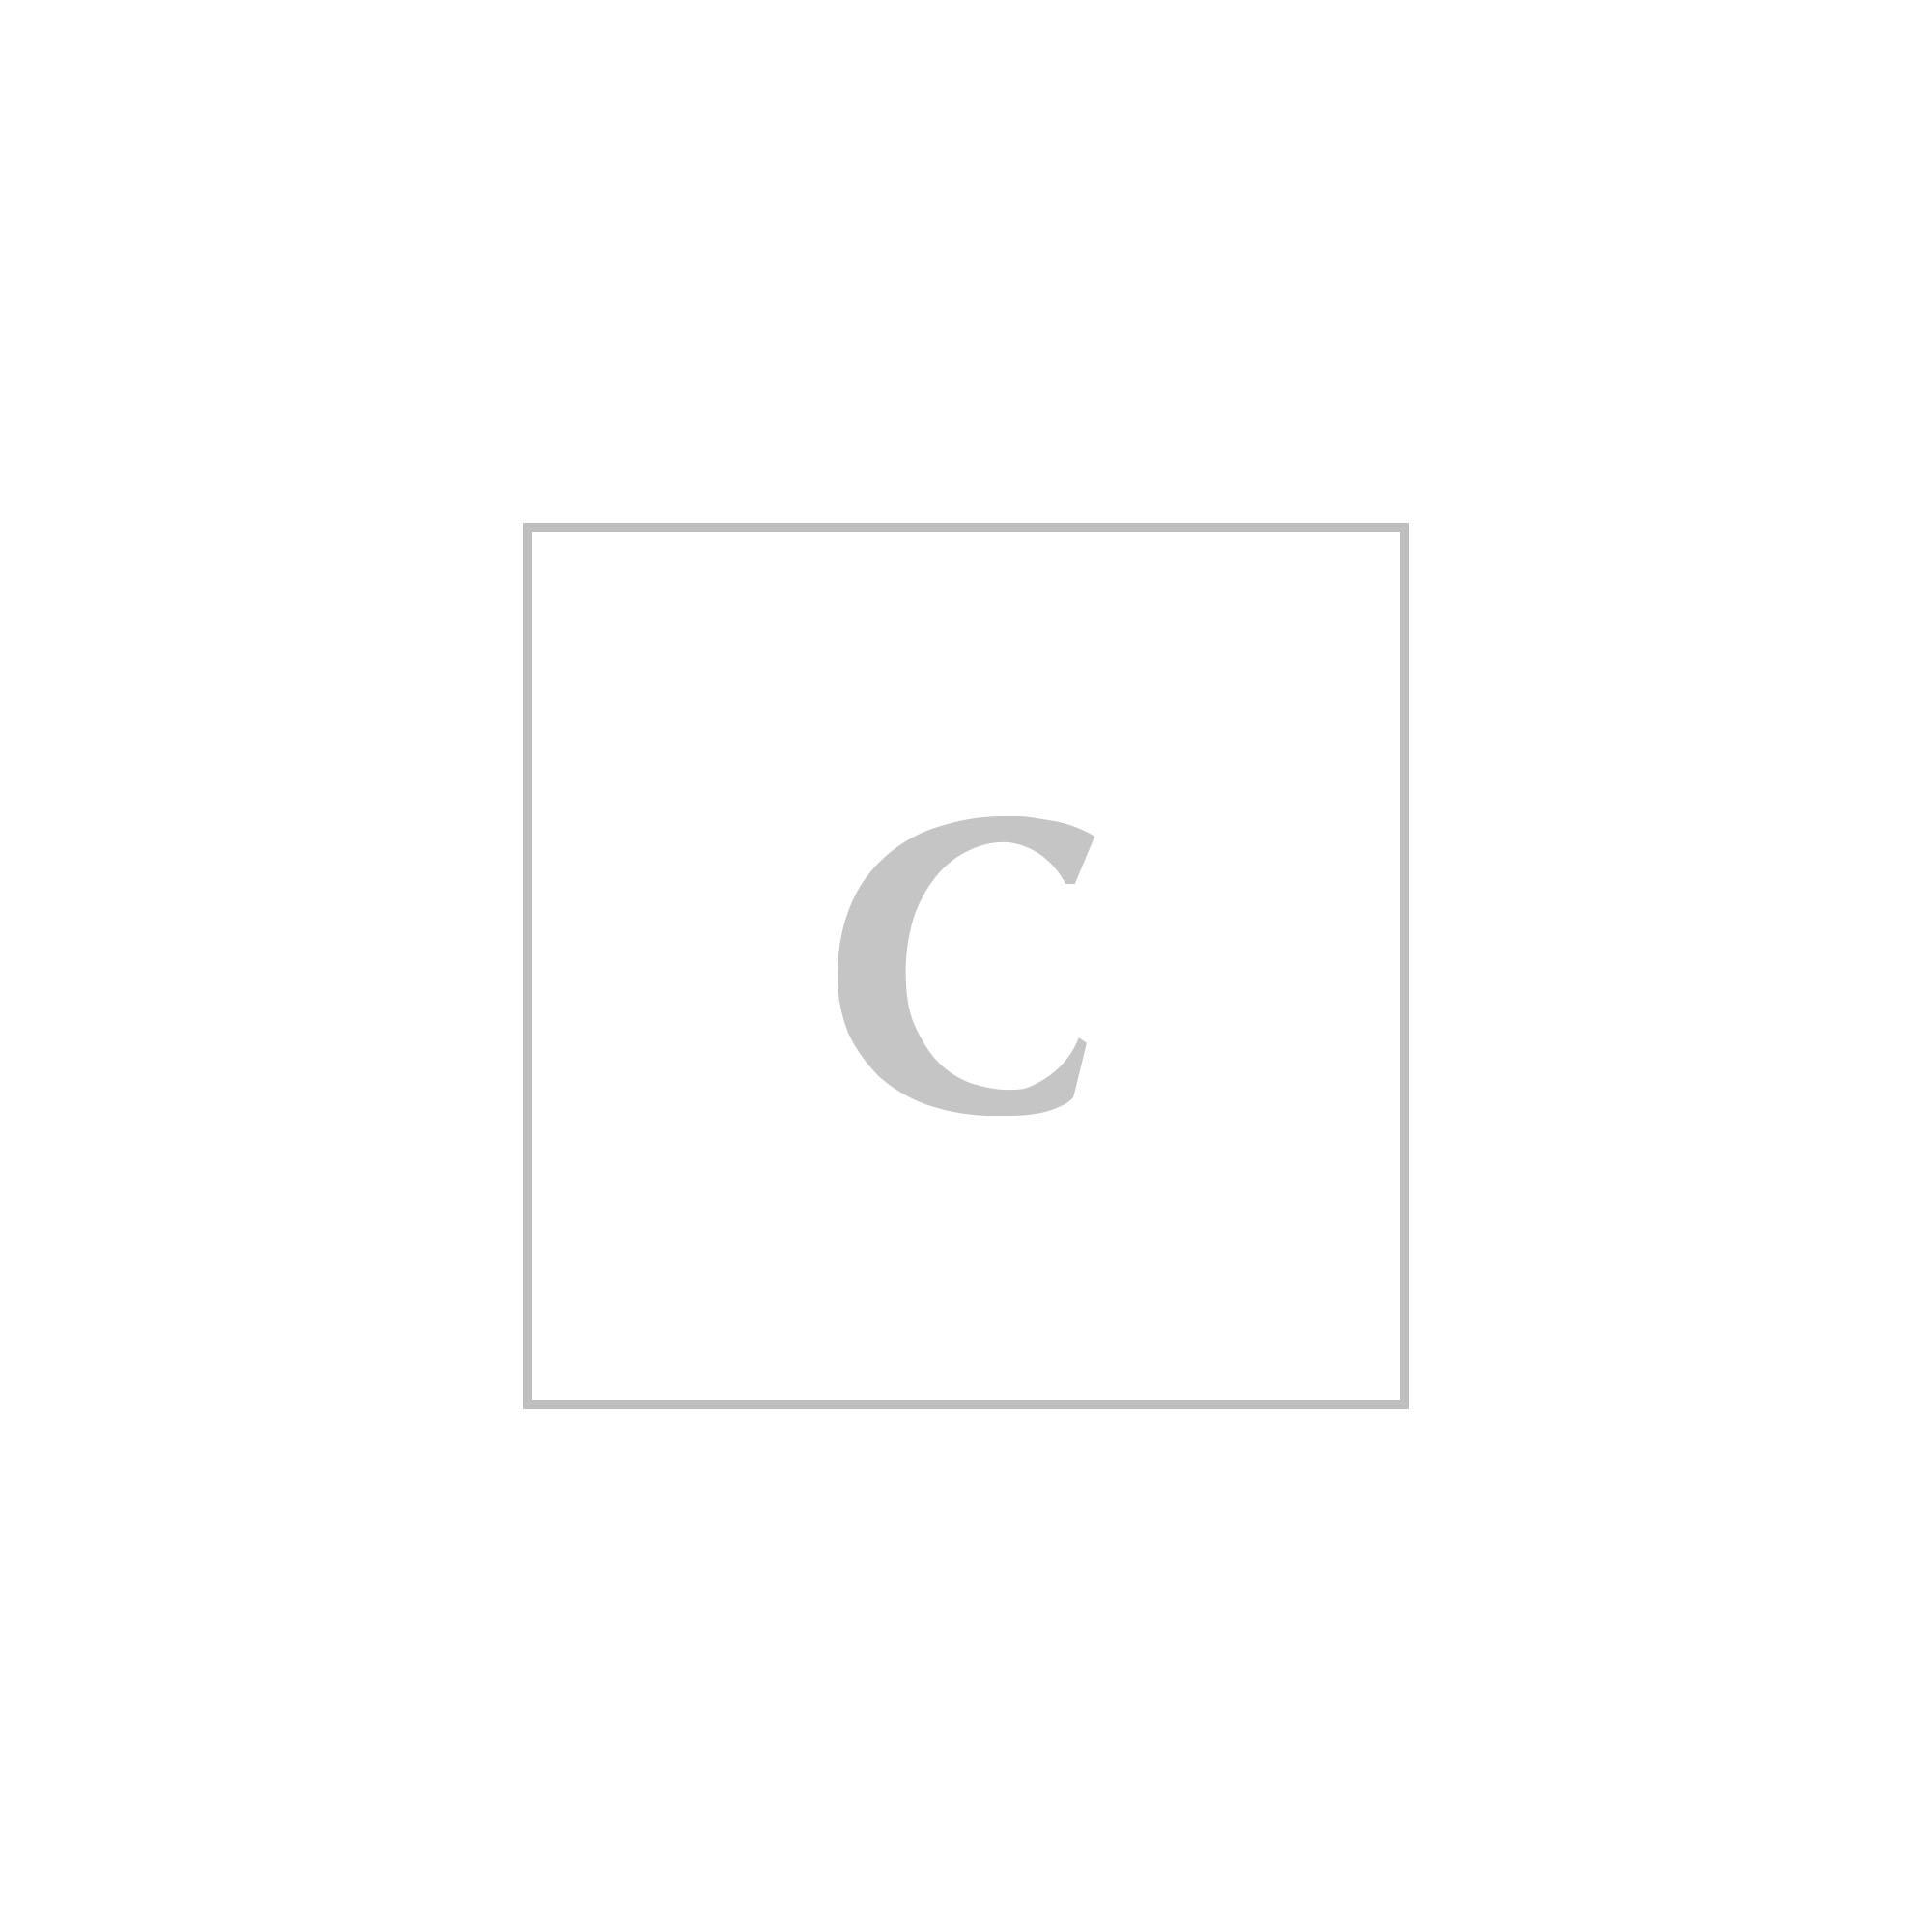 Dolce & gabbana francesina michelangelo